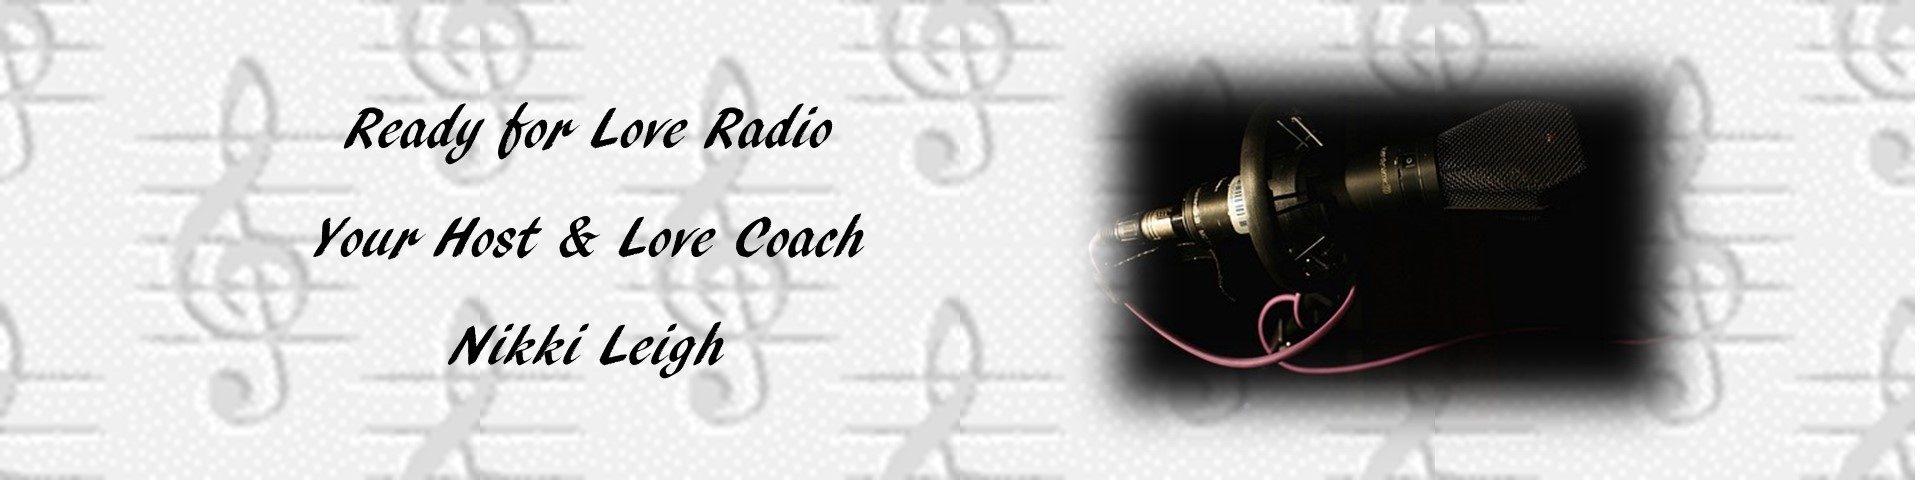 Ready For Love Radio